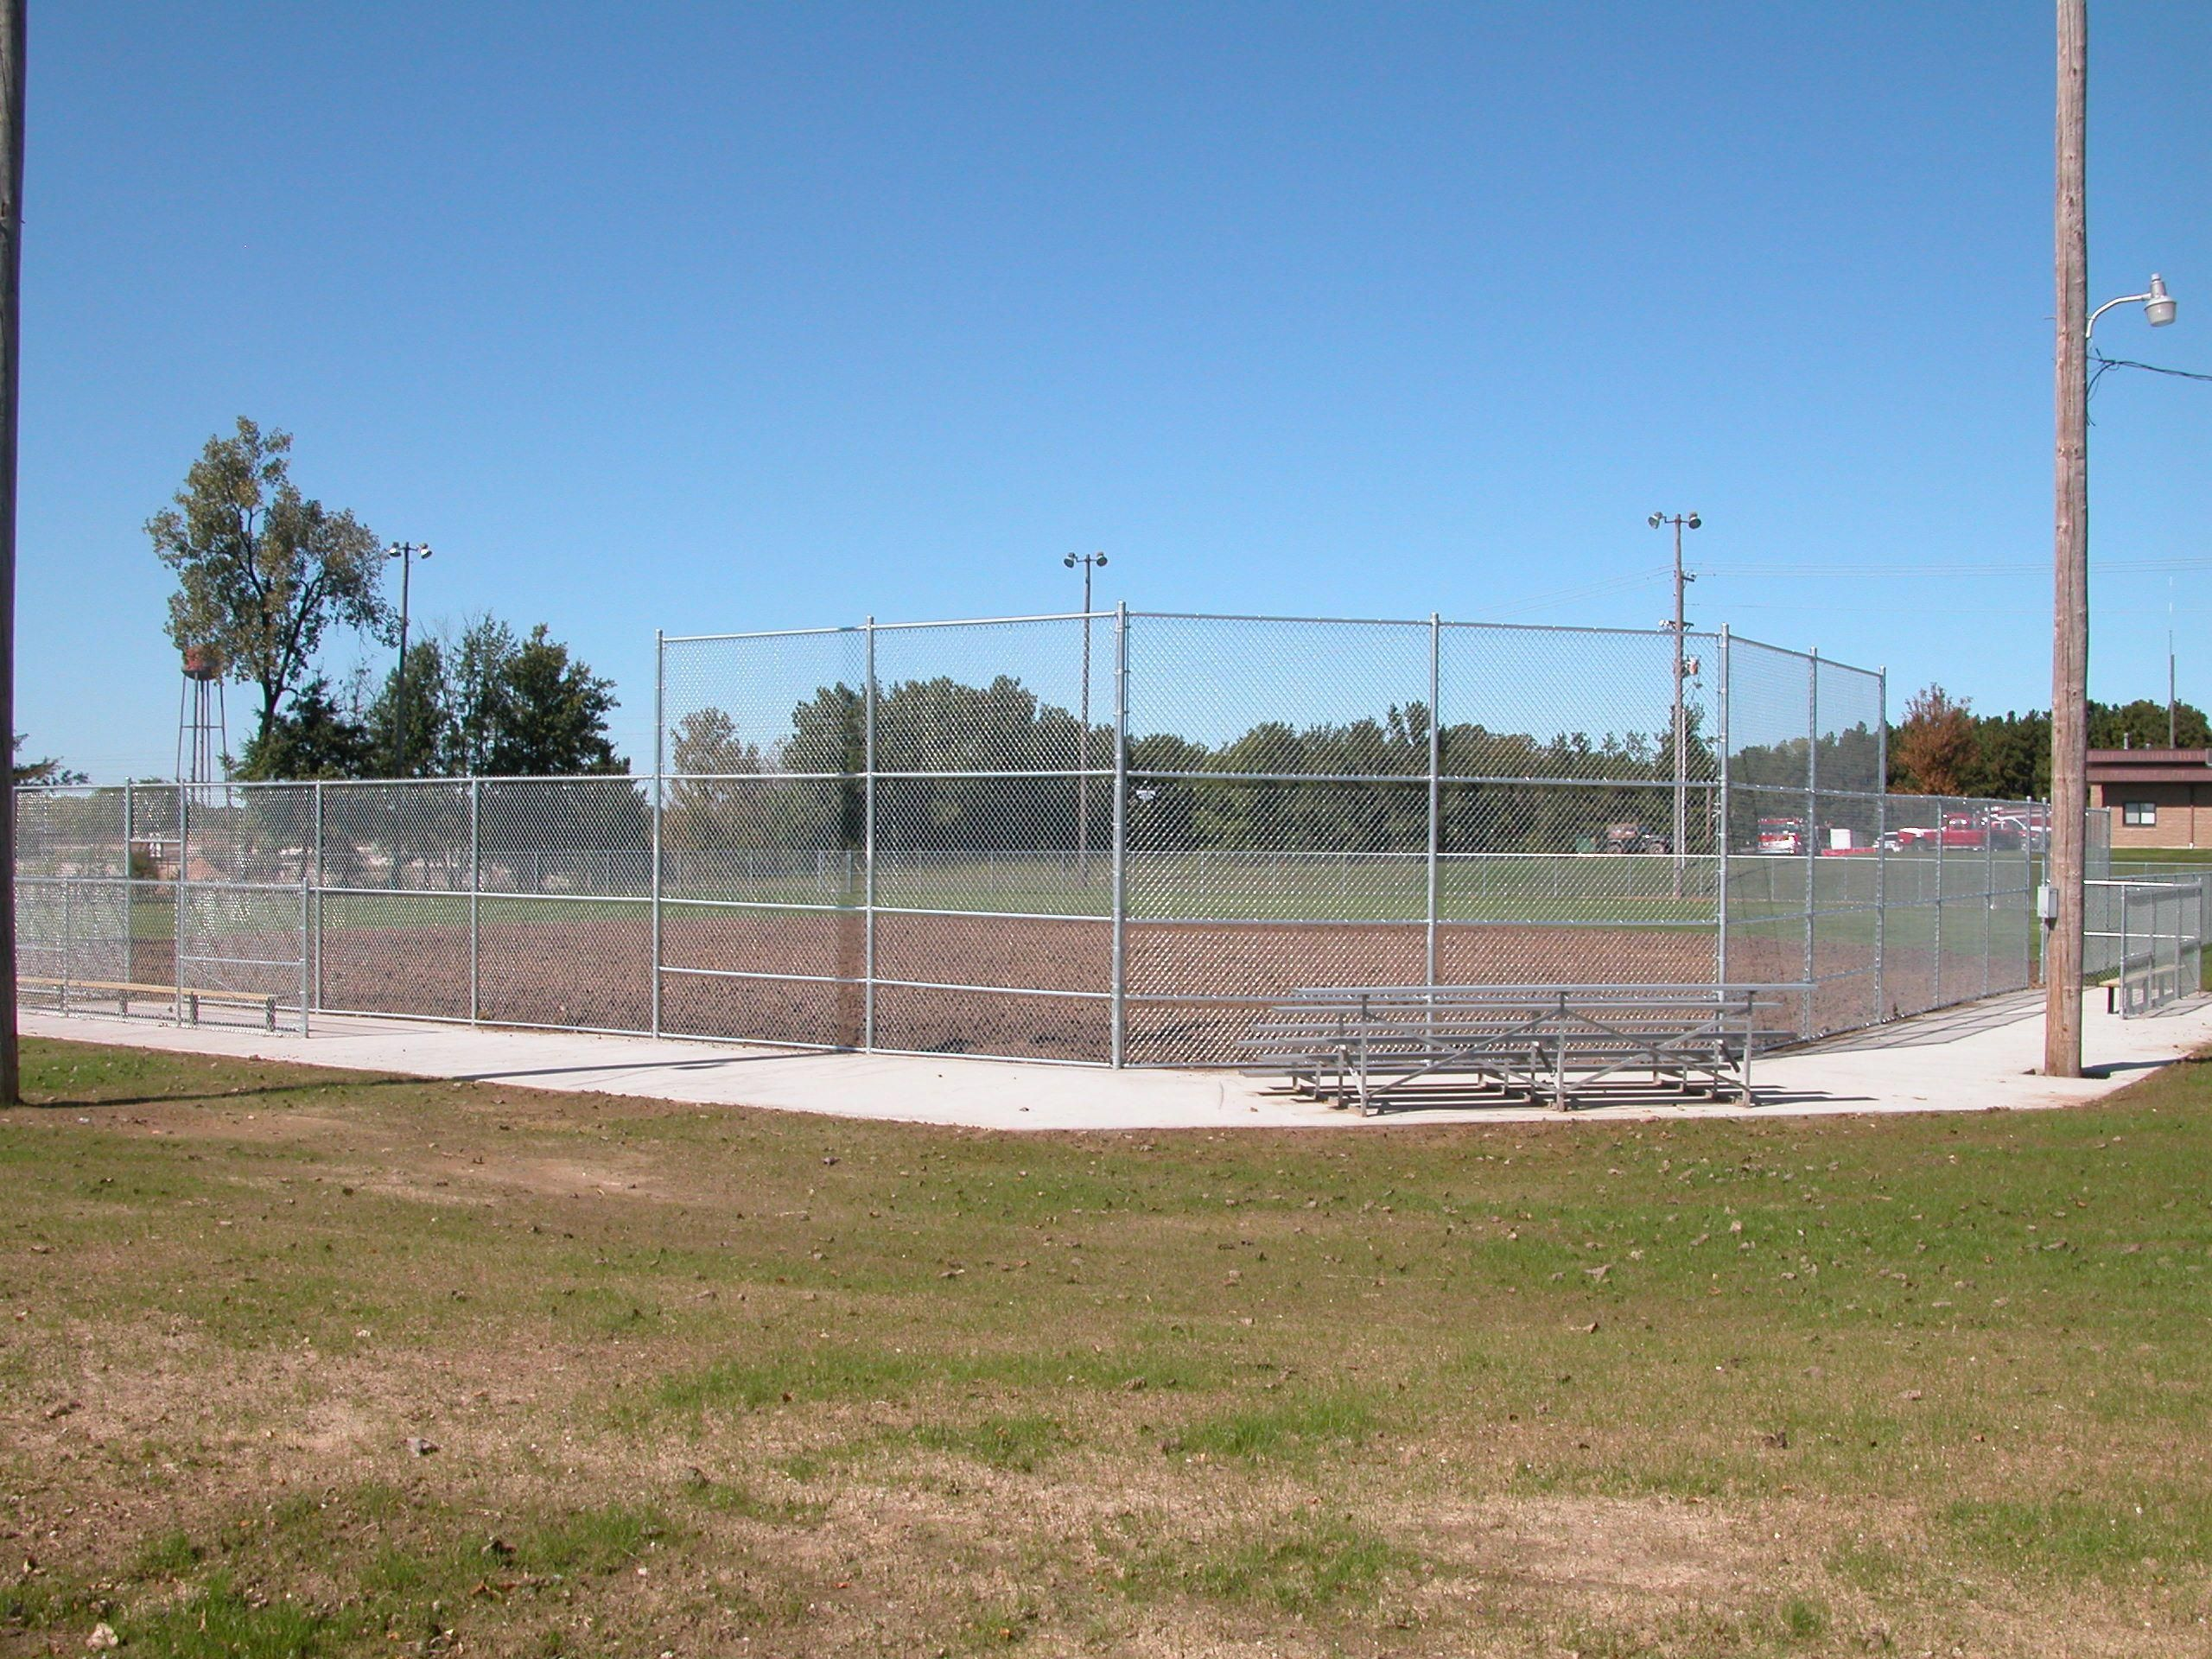 Basketball Birthday Party Basketballcourtforsale Refferal 1979165785 Park Trails Basketball Park Sand Volleyball Court